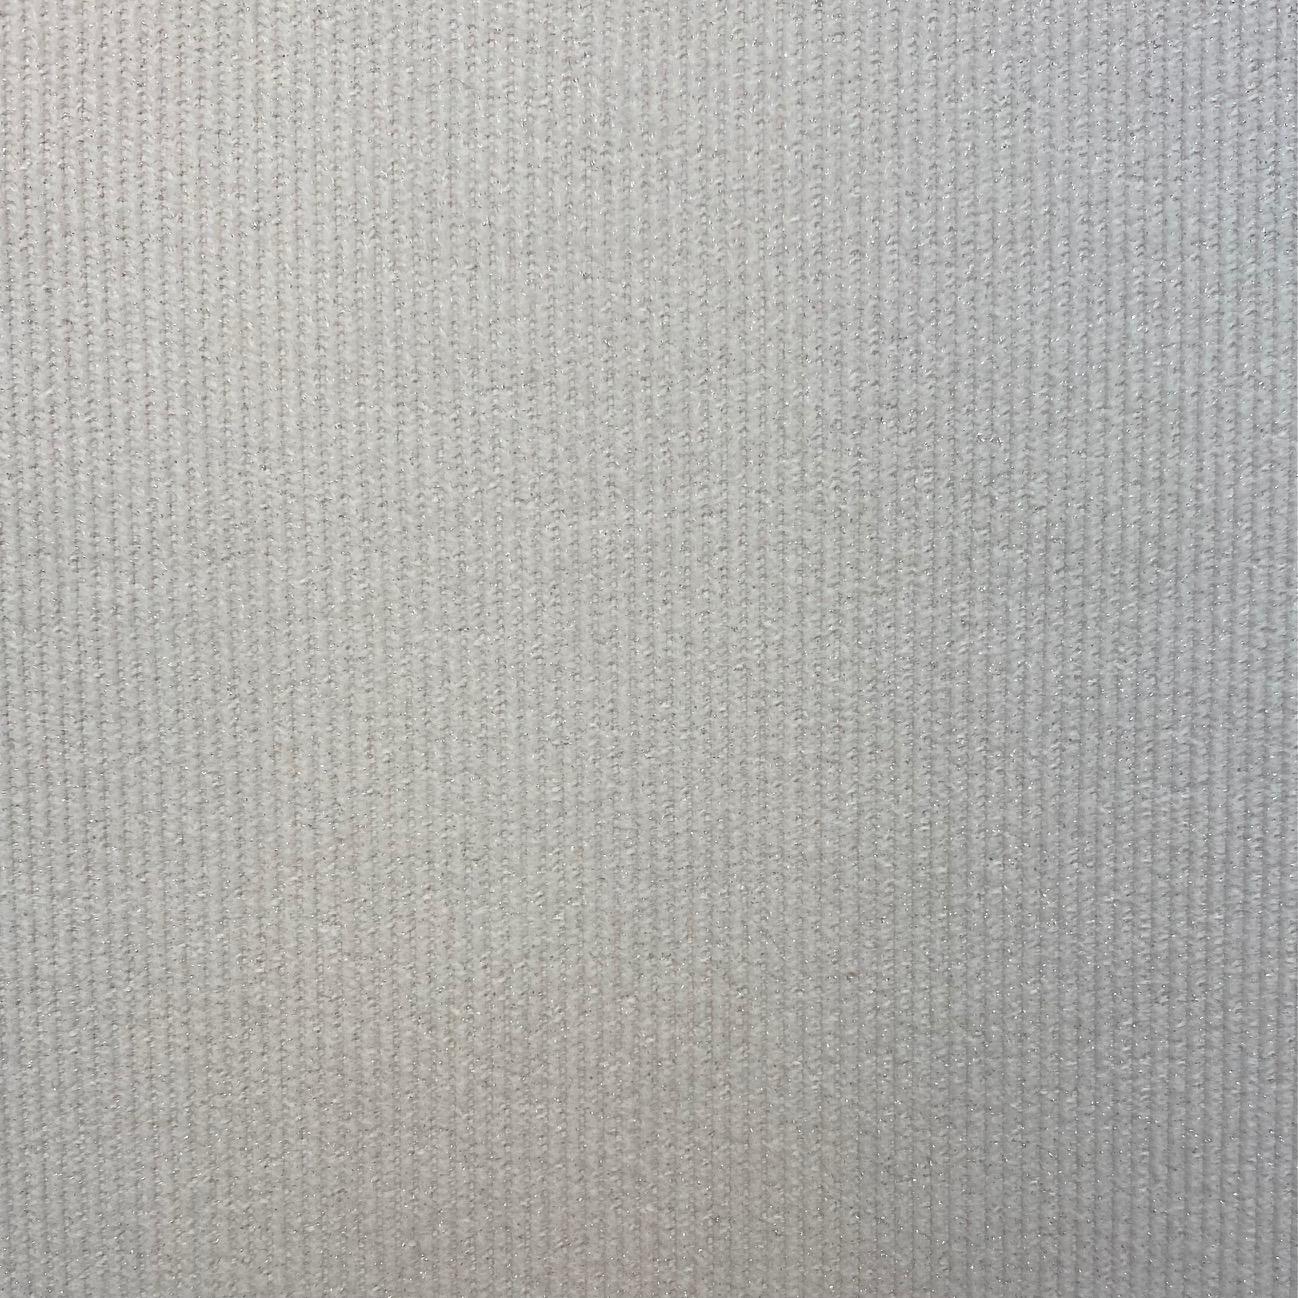 Feincord Stretch mit Glitzer, creme. Art. 871014.622